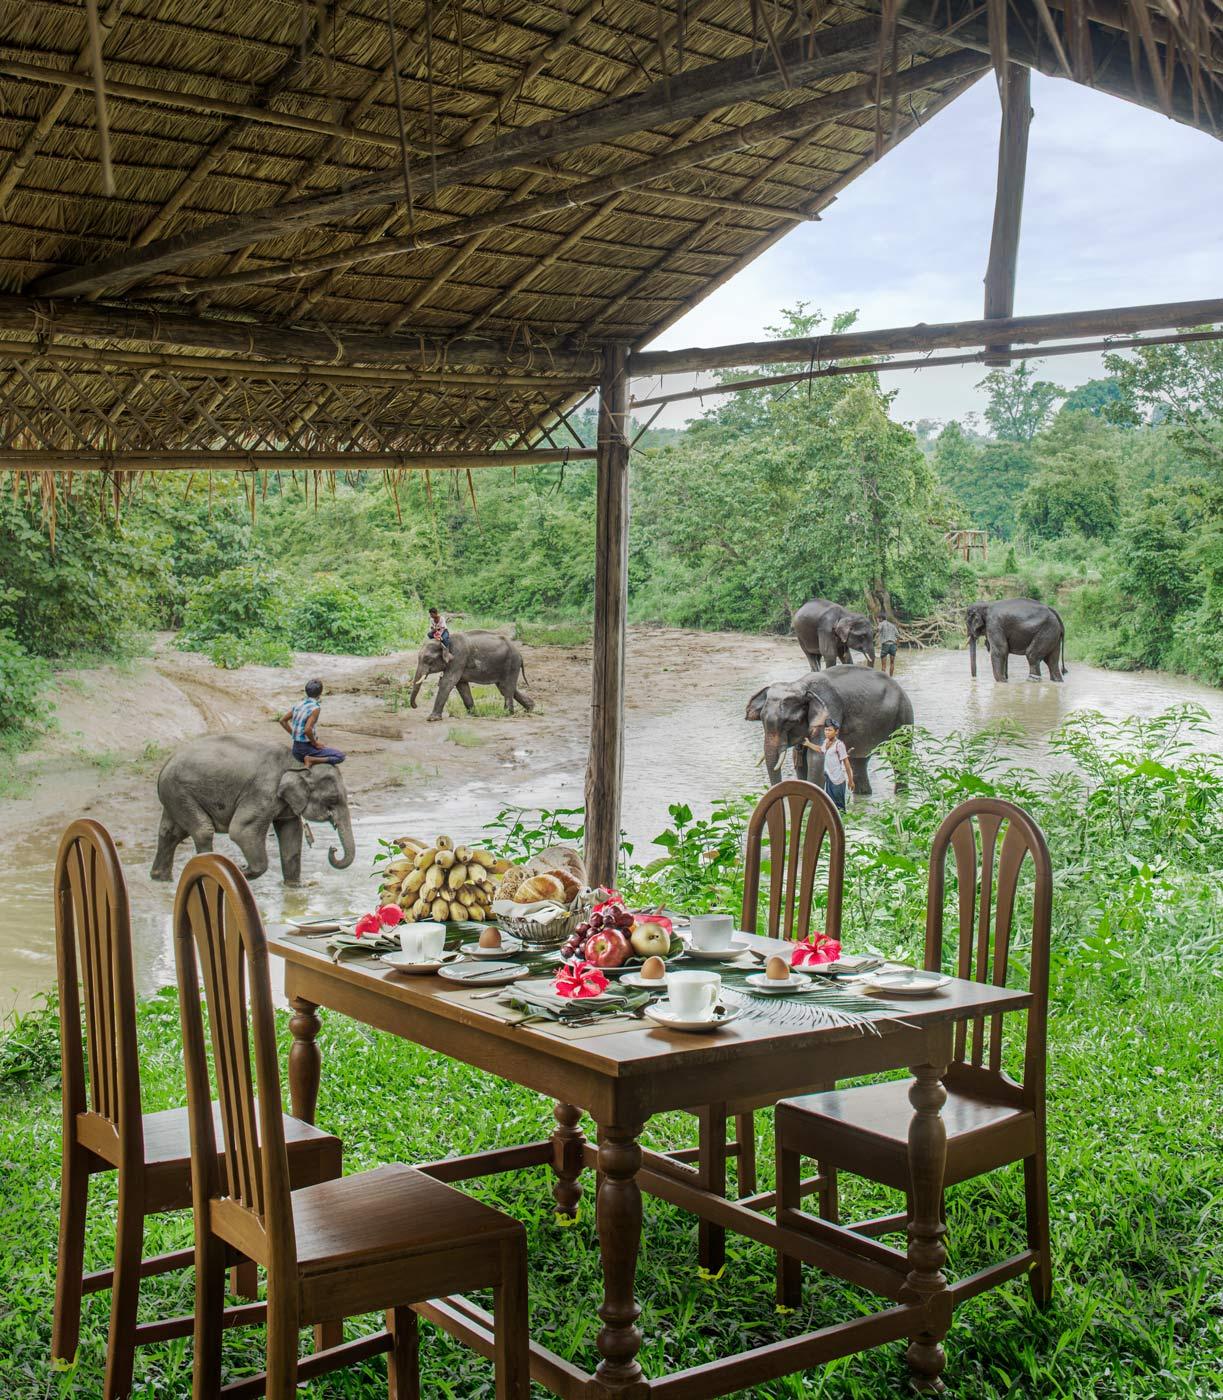 Breakfast-at-elephant-farm